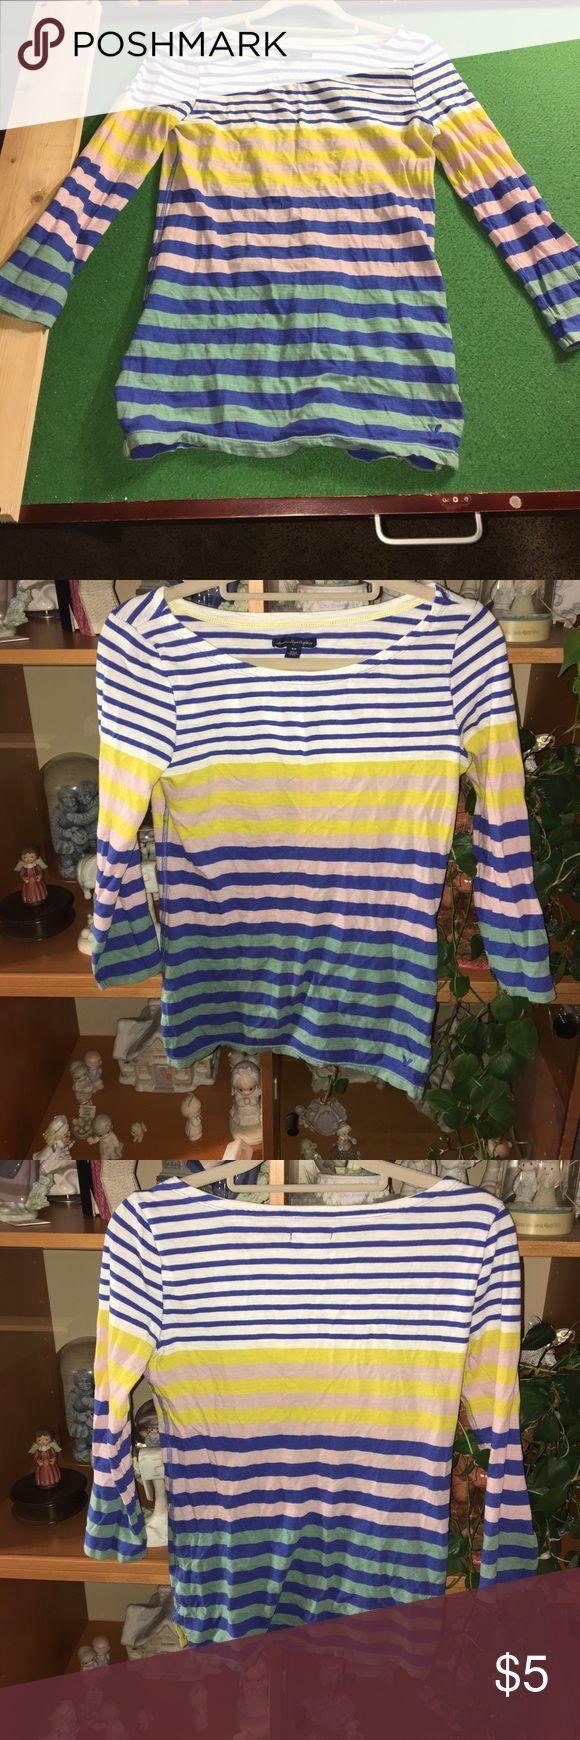 American Eagle 3/4 sleeve striped shirt American Eagle Outfitters 3/4 sleeve multi colored striped shirt. Size: Small American Eagle Outfitters Tops